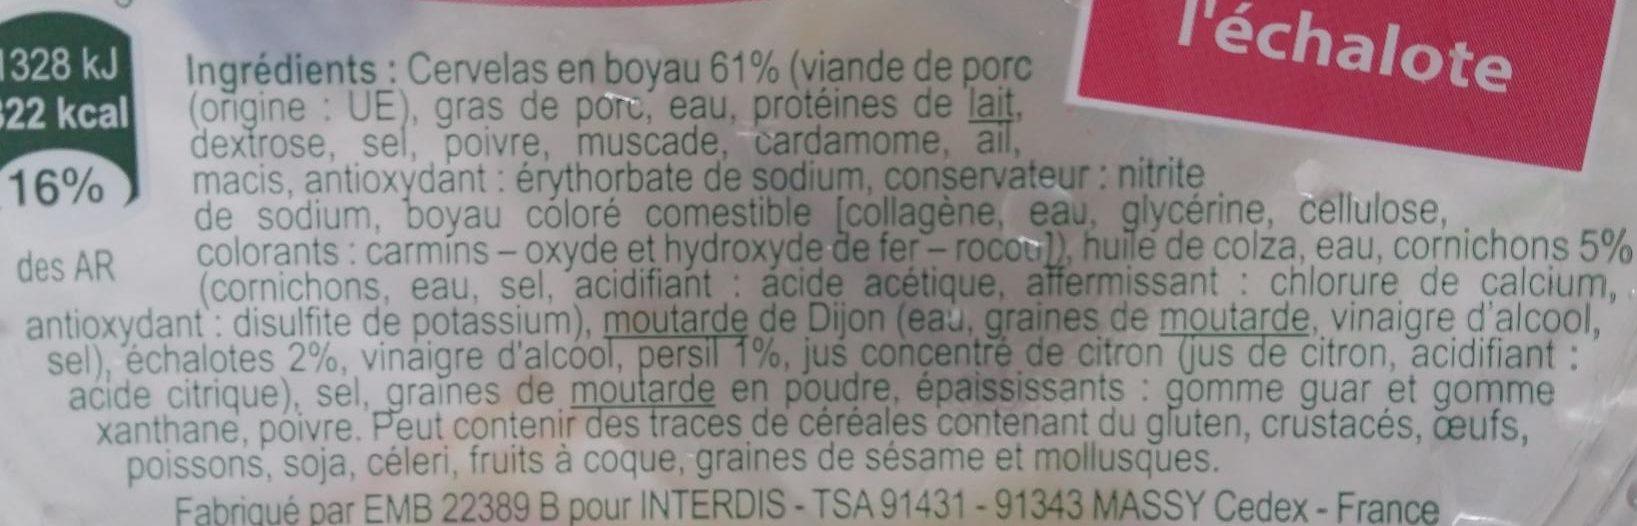 Cervelas sauce à l'Échalote - Ingrediënten - fr